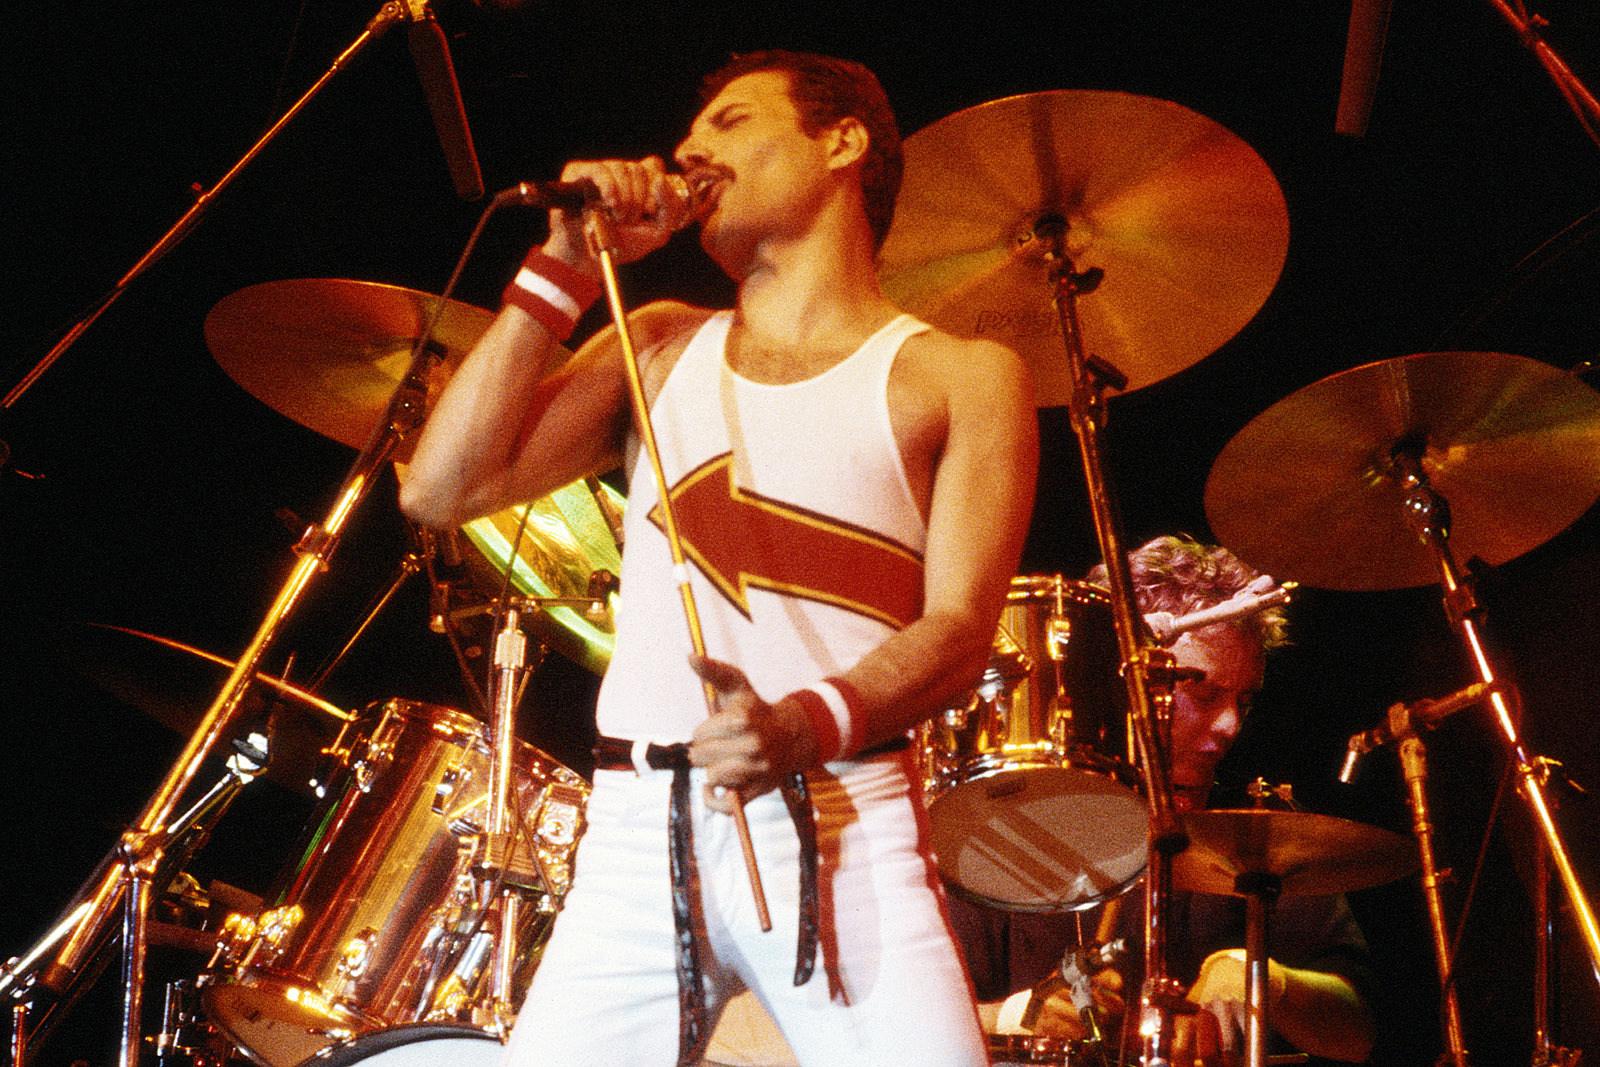 'Bohemian Rhapsody' Gives Queen Highest Chart Position Since 1980